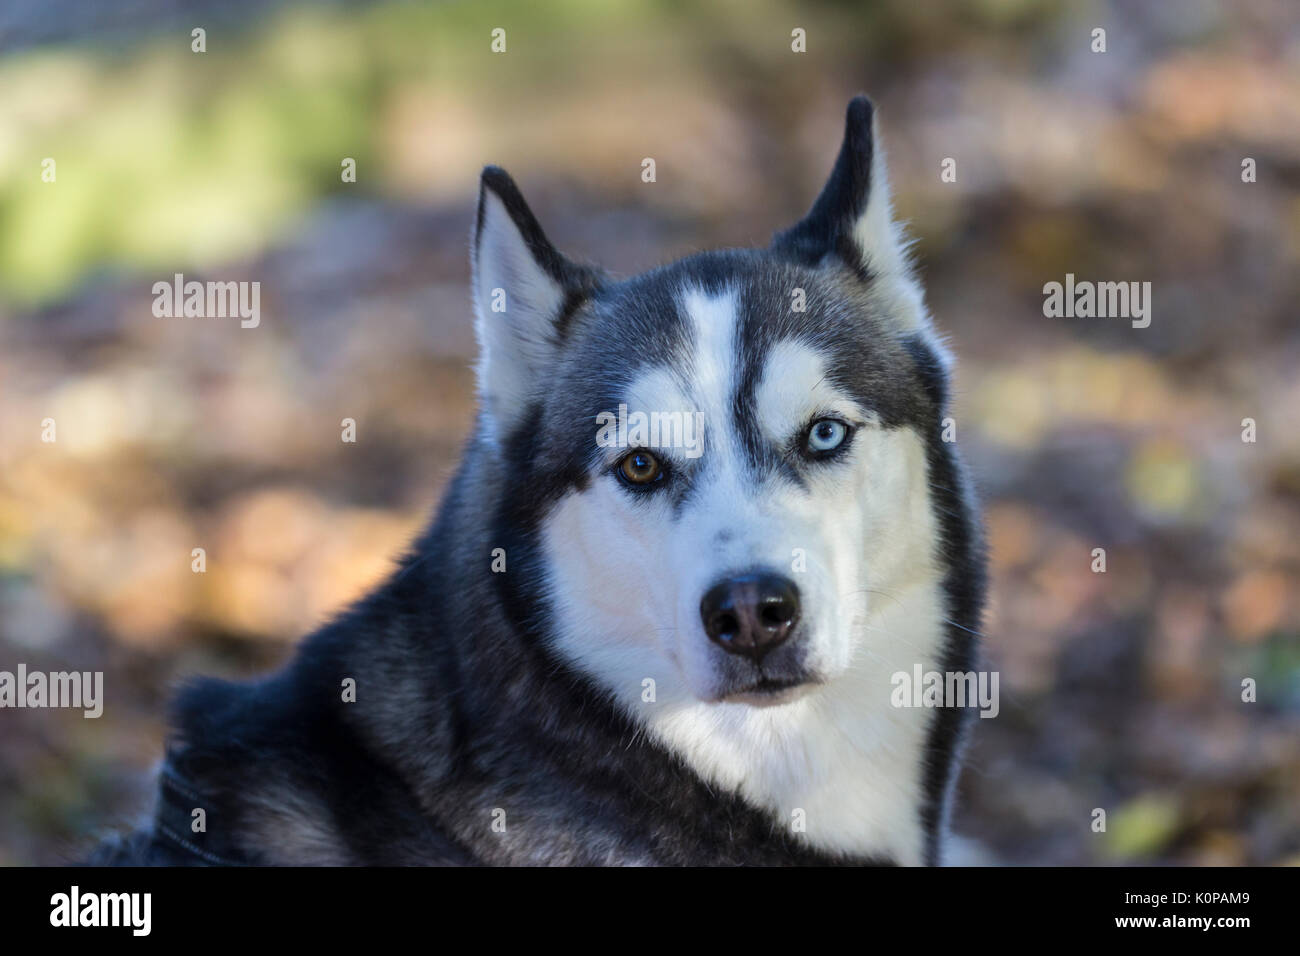 Siberian Husky watching - Stock Image